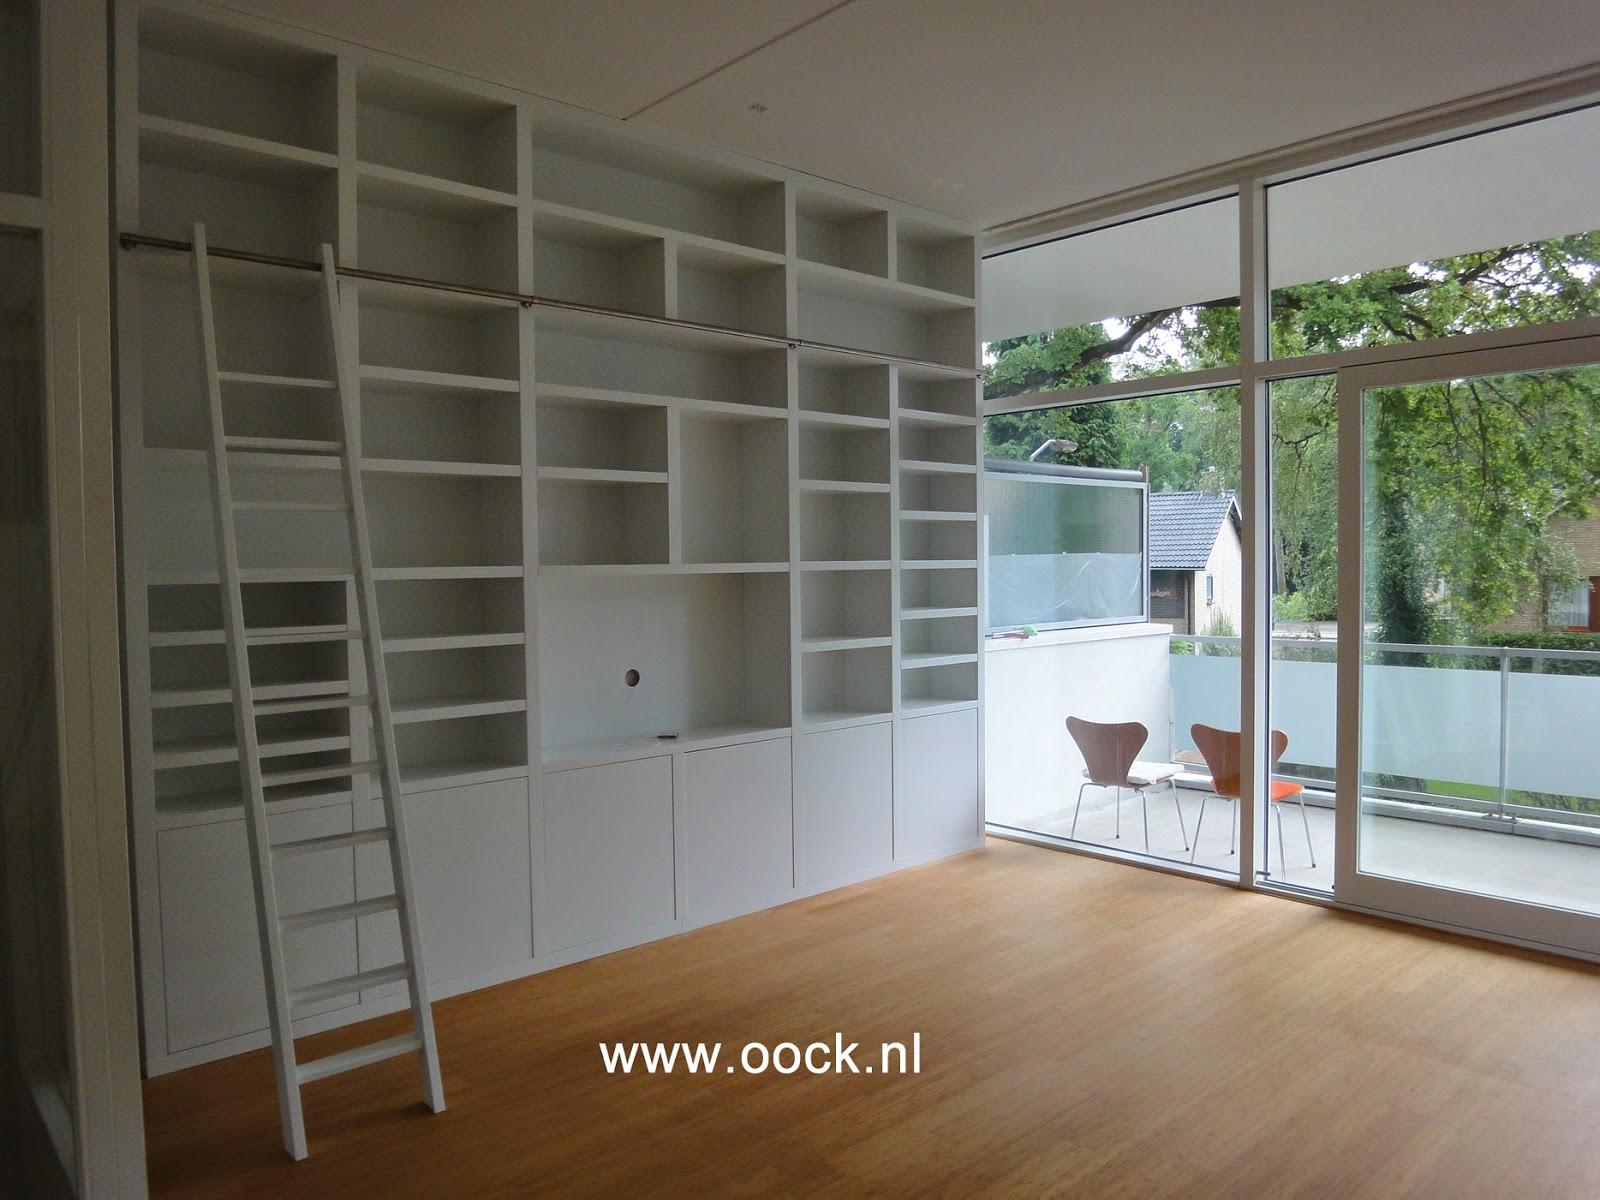 Interieurbouw trends in maatwerk boekenkasten - Moderne boekenkast ...